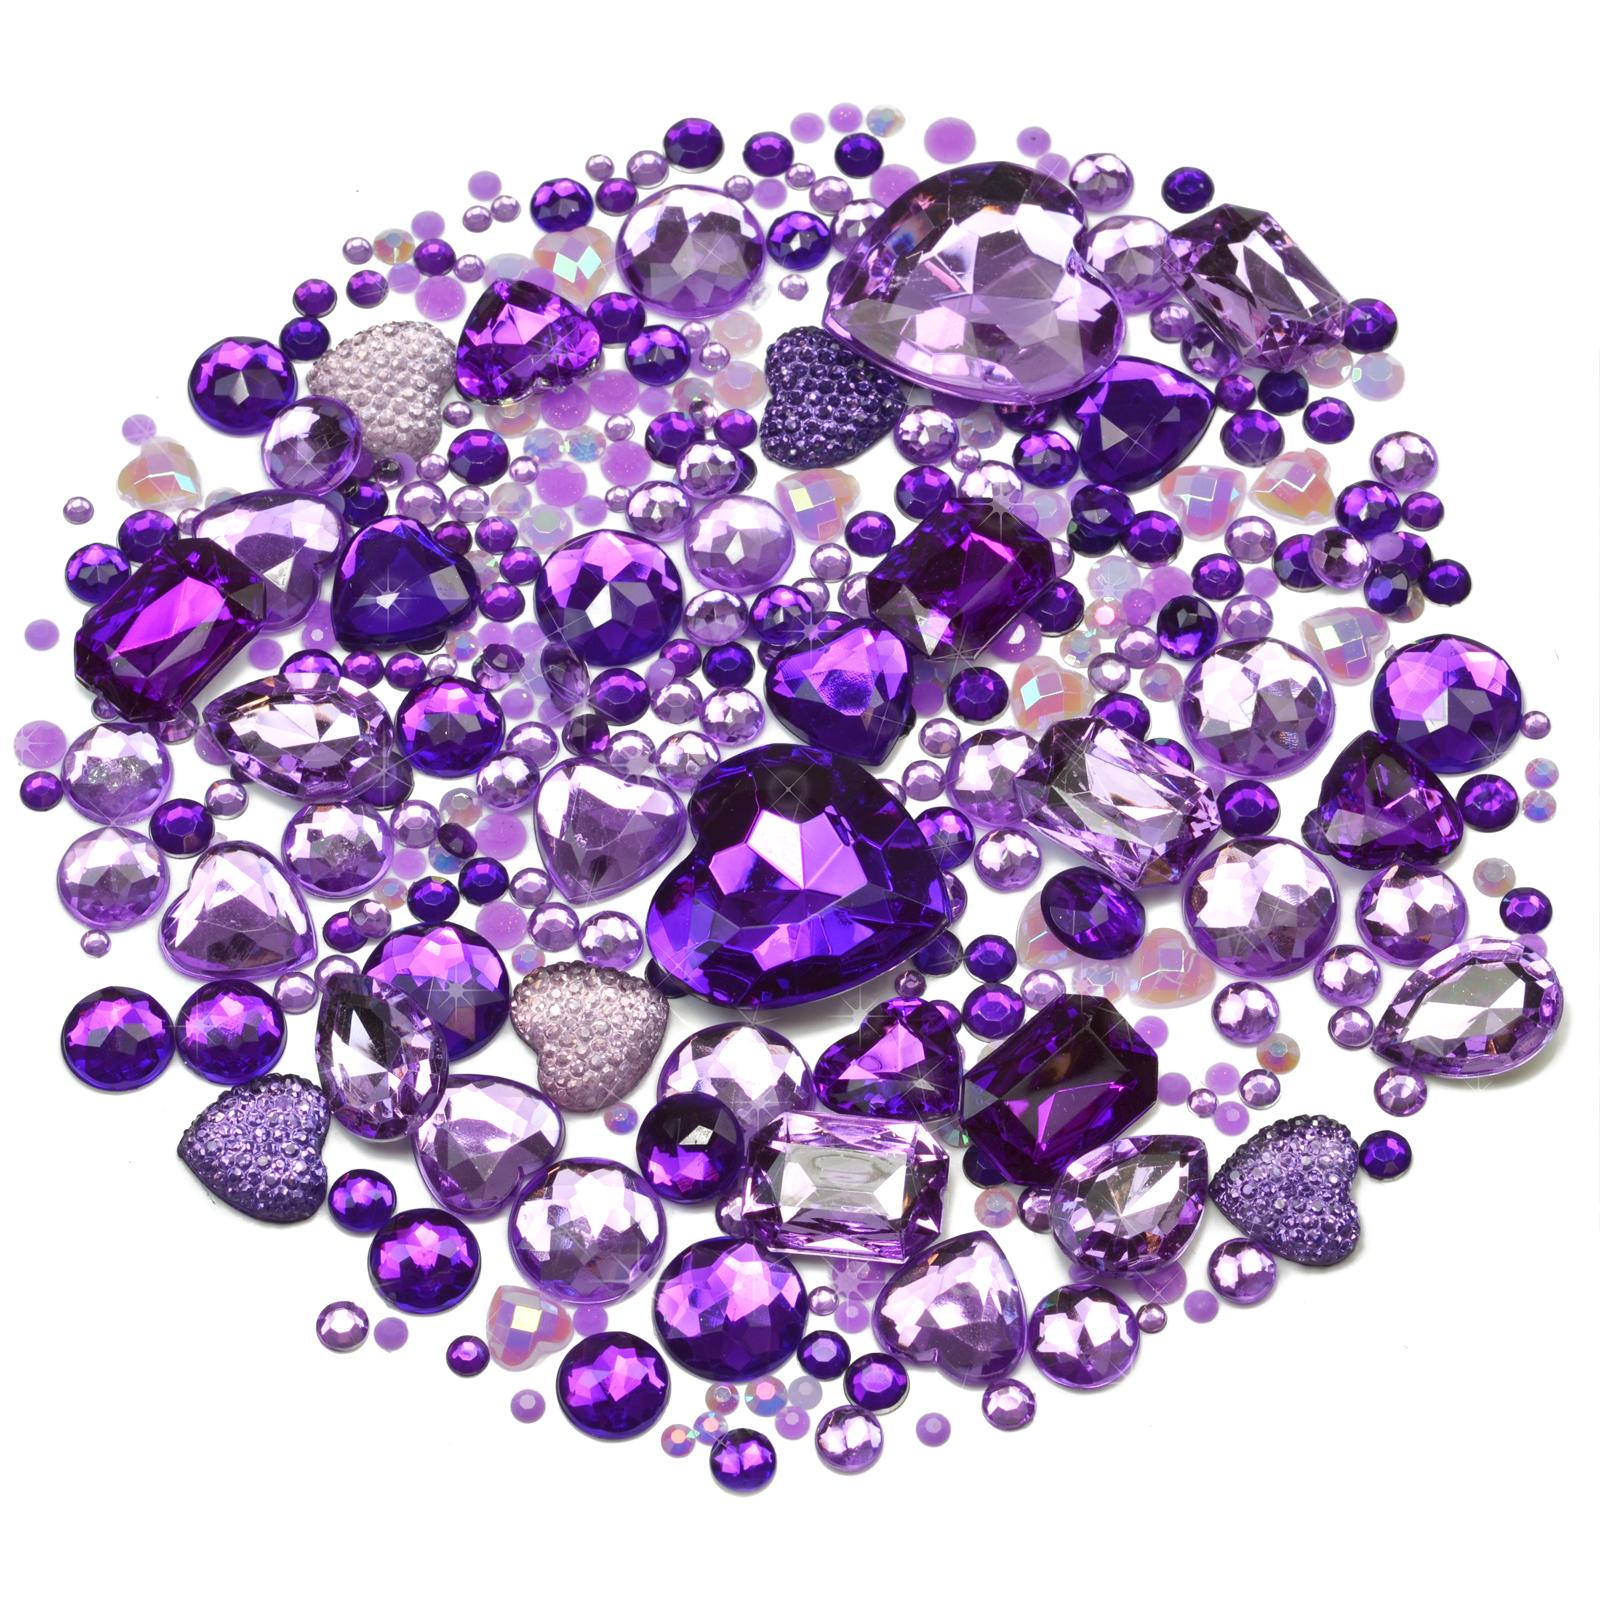 ICE Mix//Set of Gems Rhinestones Diamantes Crystal Embellishments Craft Decoden